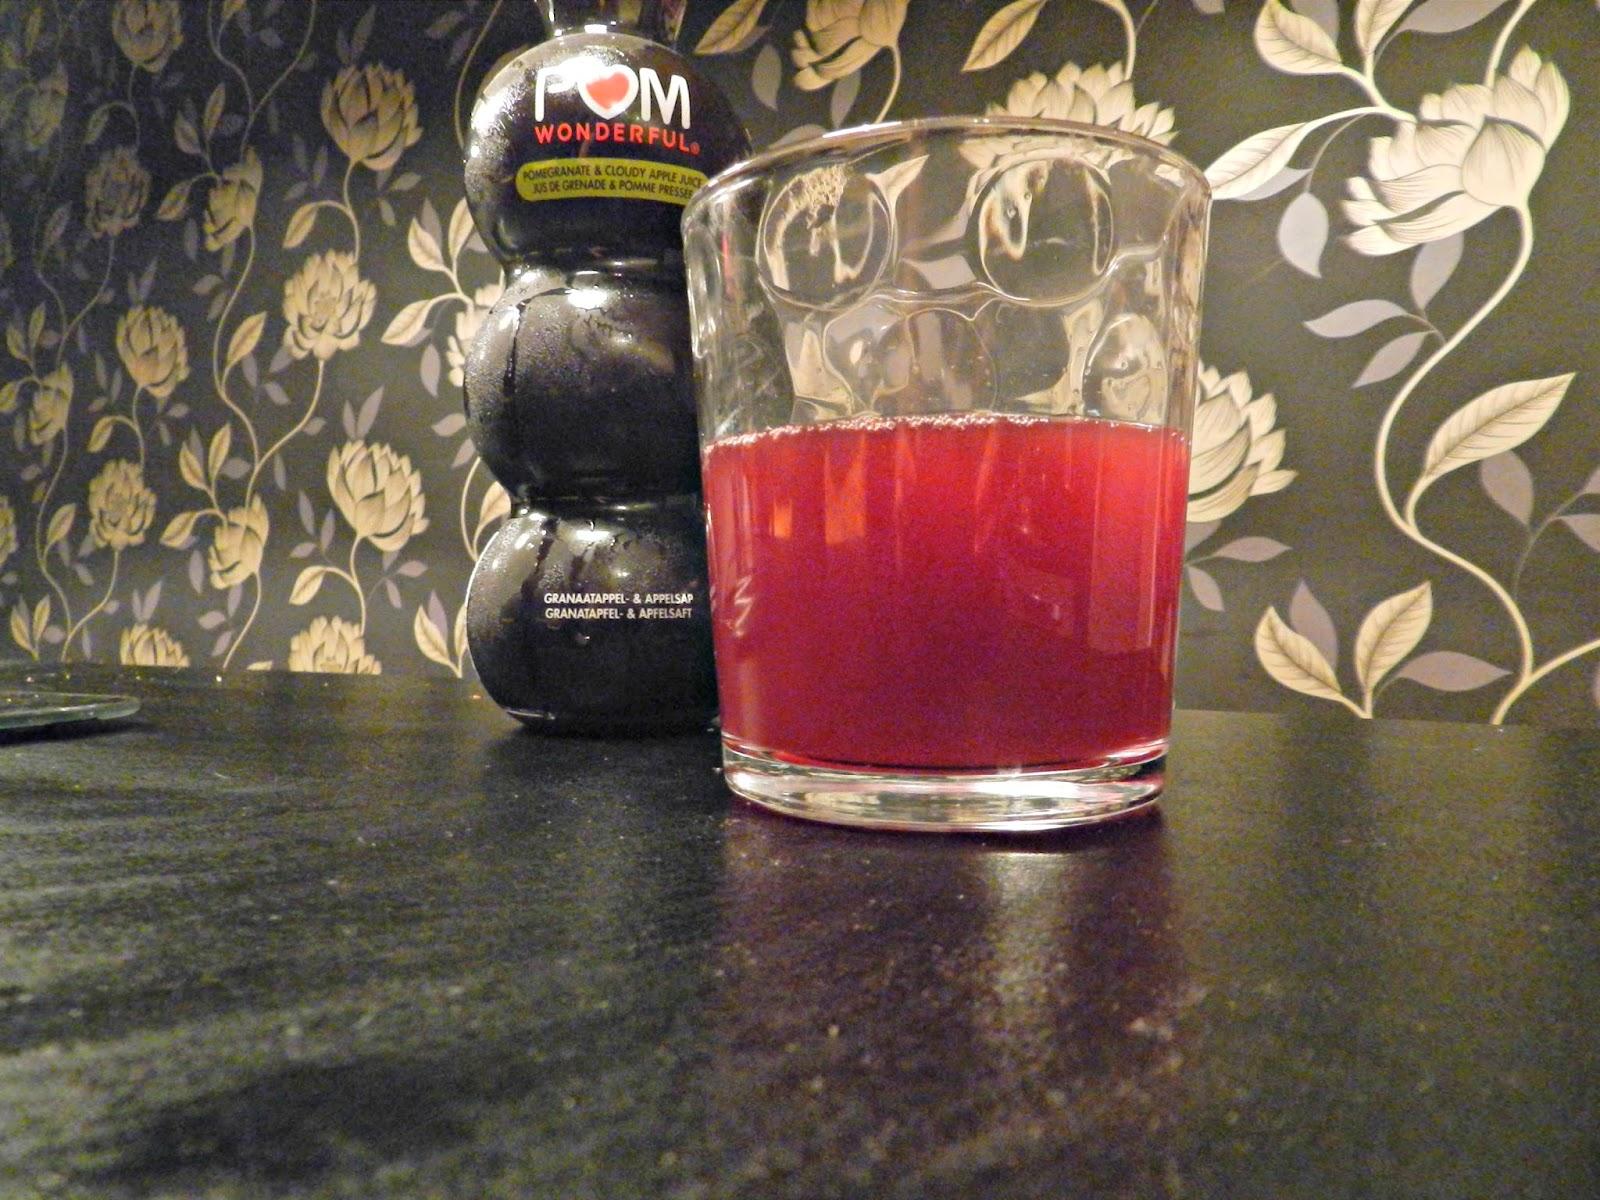 Pom Wonderful Juice